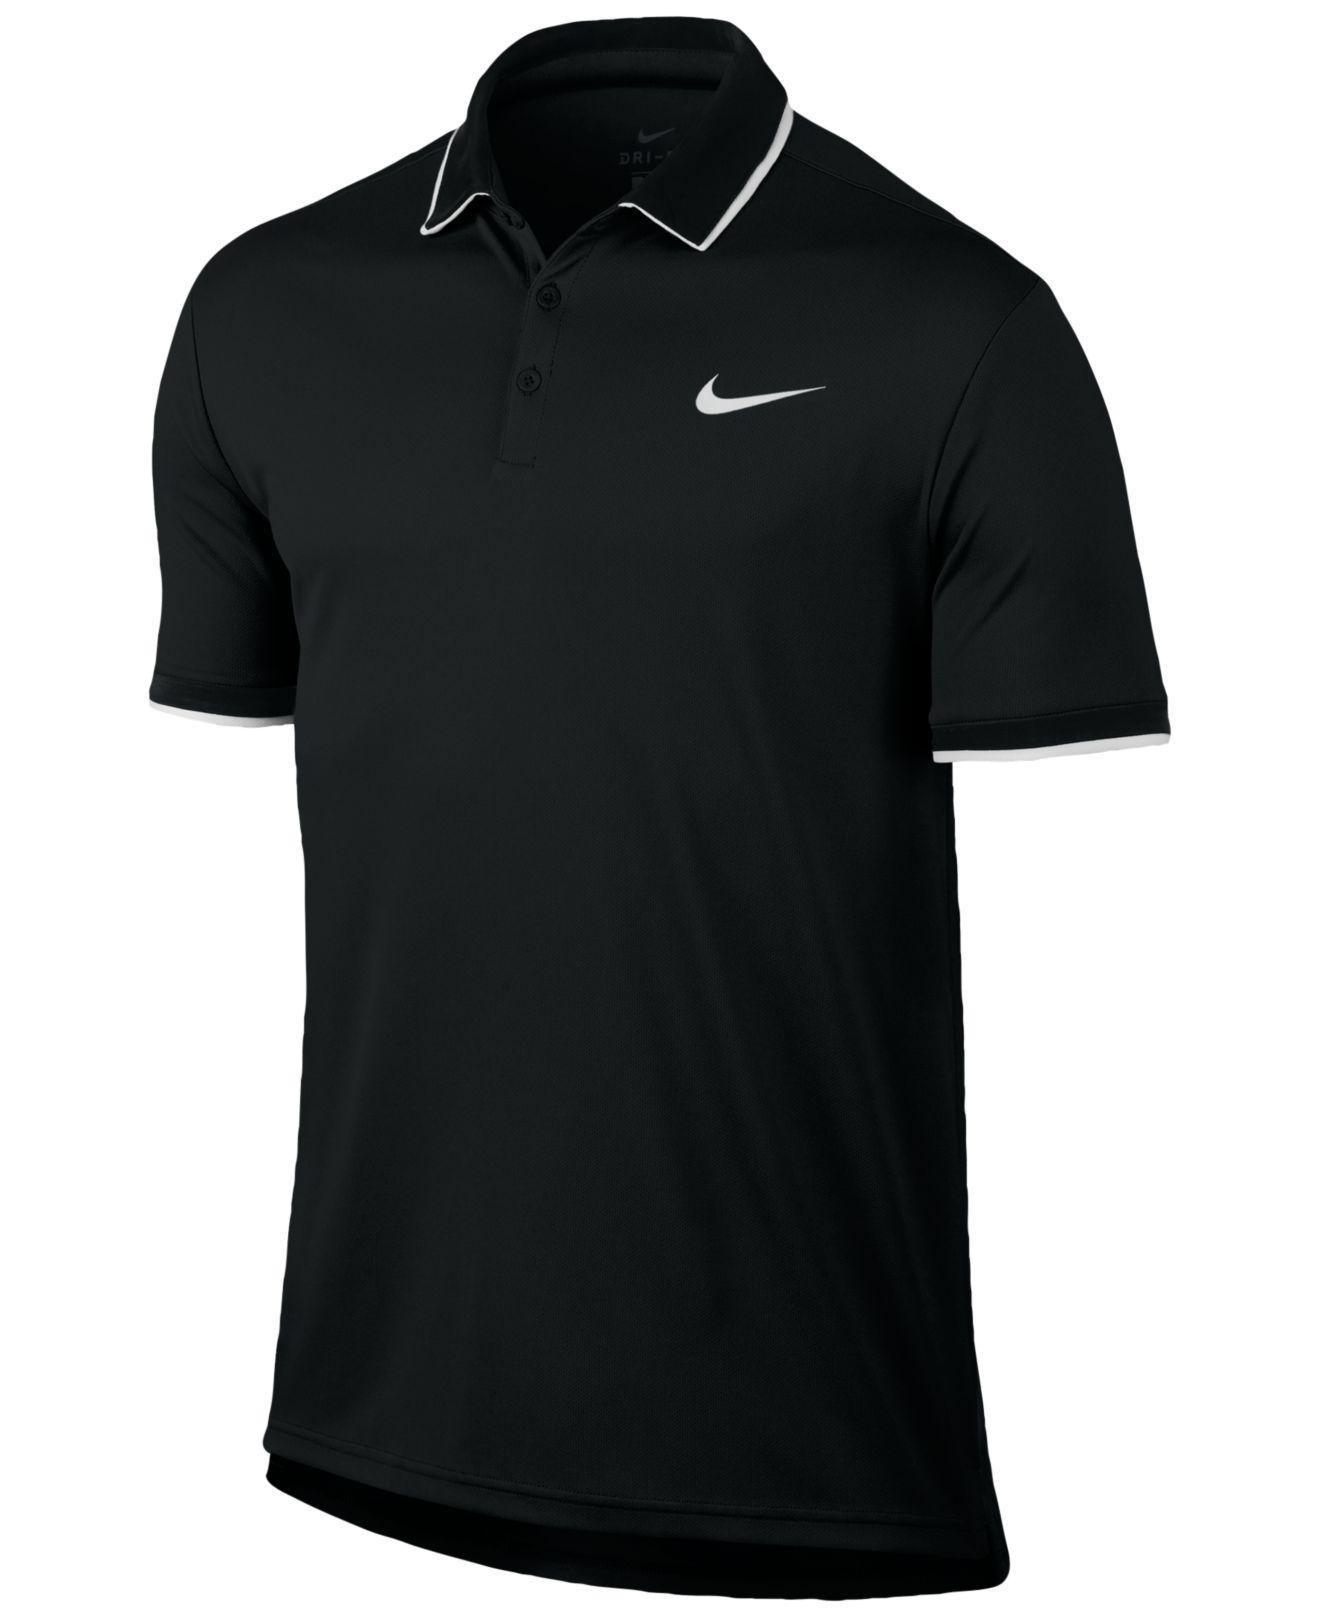 c20879d1 Lyst - Nike Court Dry Tennis Polo in Black for Men